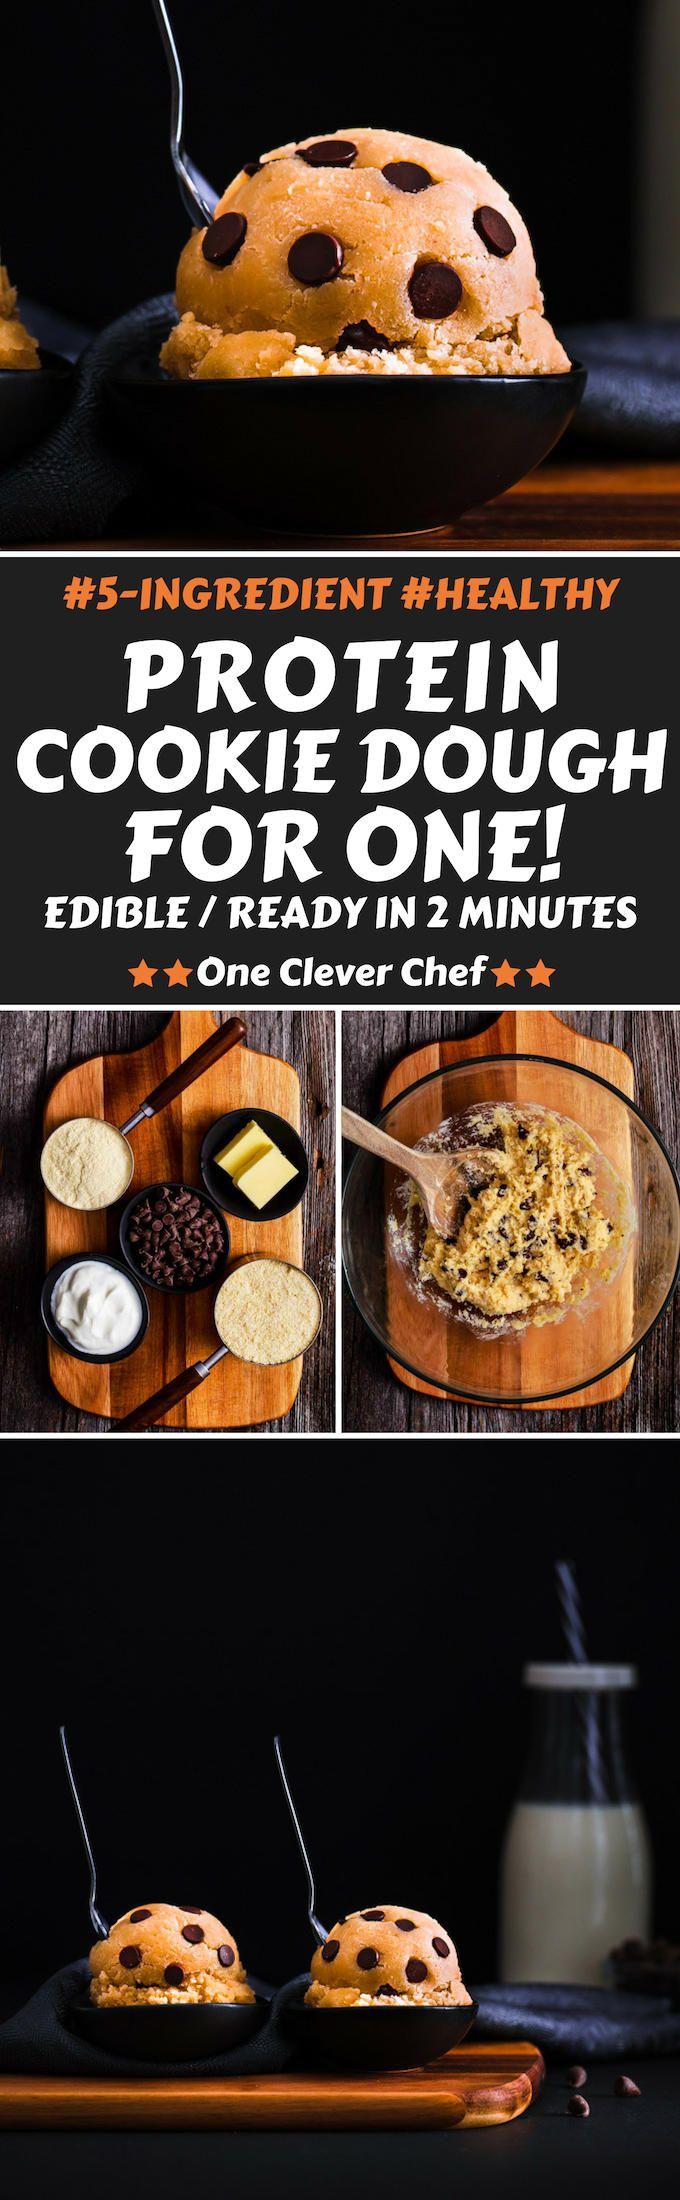 Protein Powder Cookies Dough #proteincookiedough